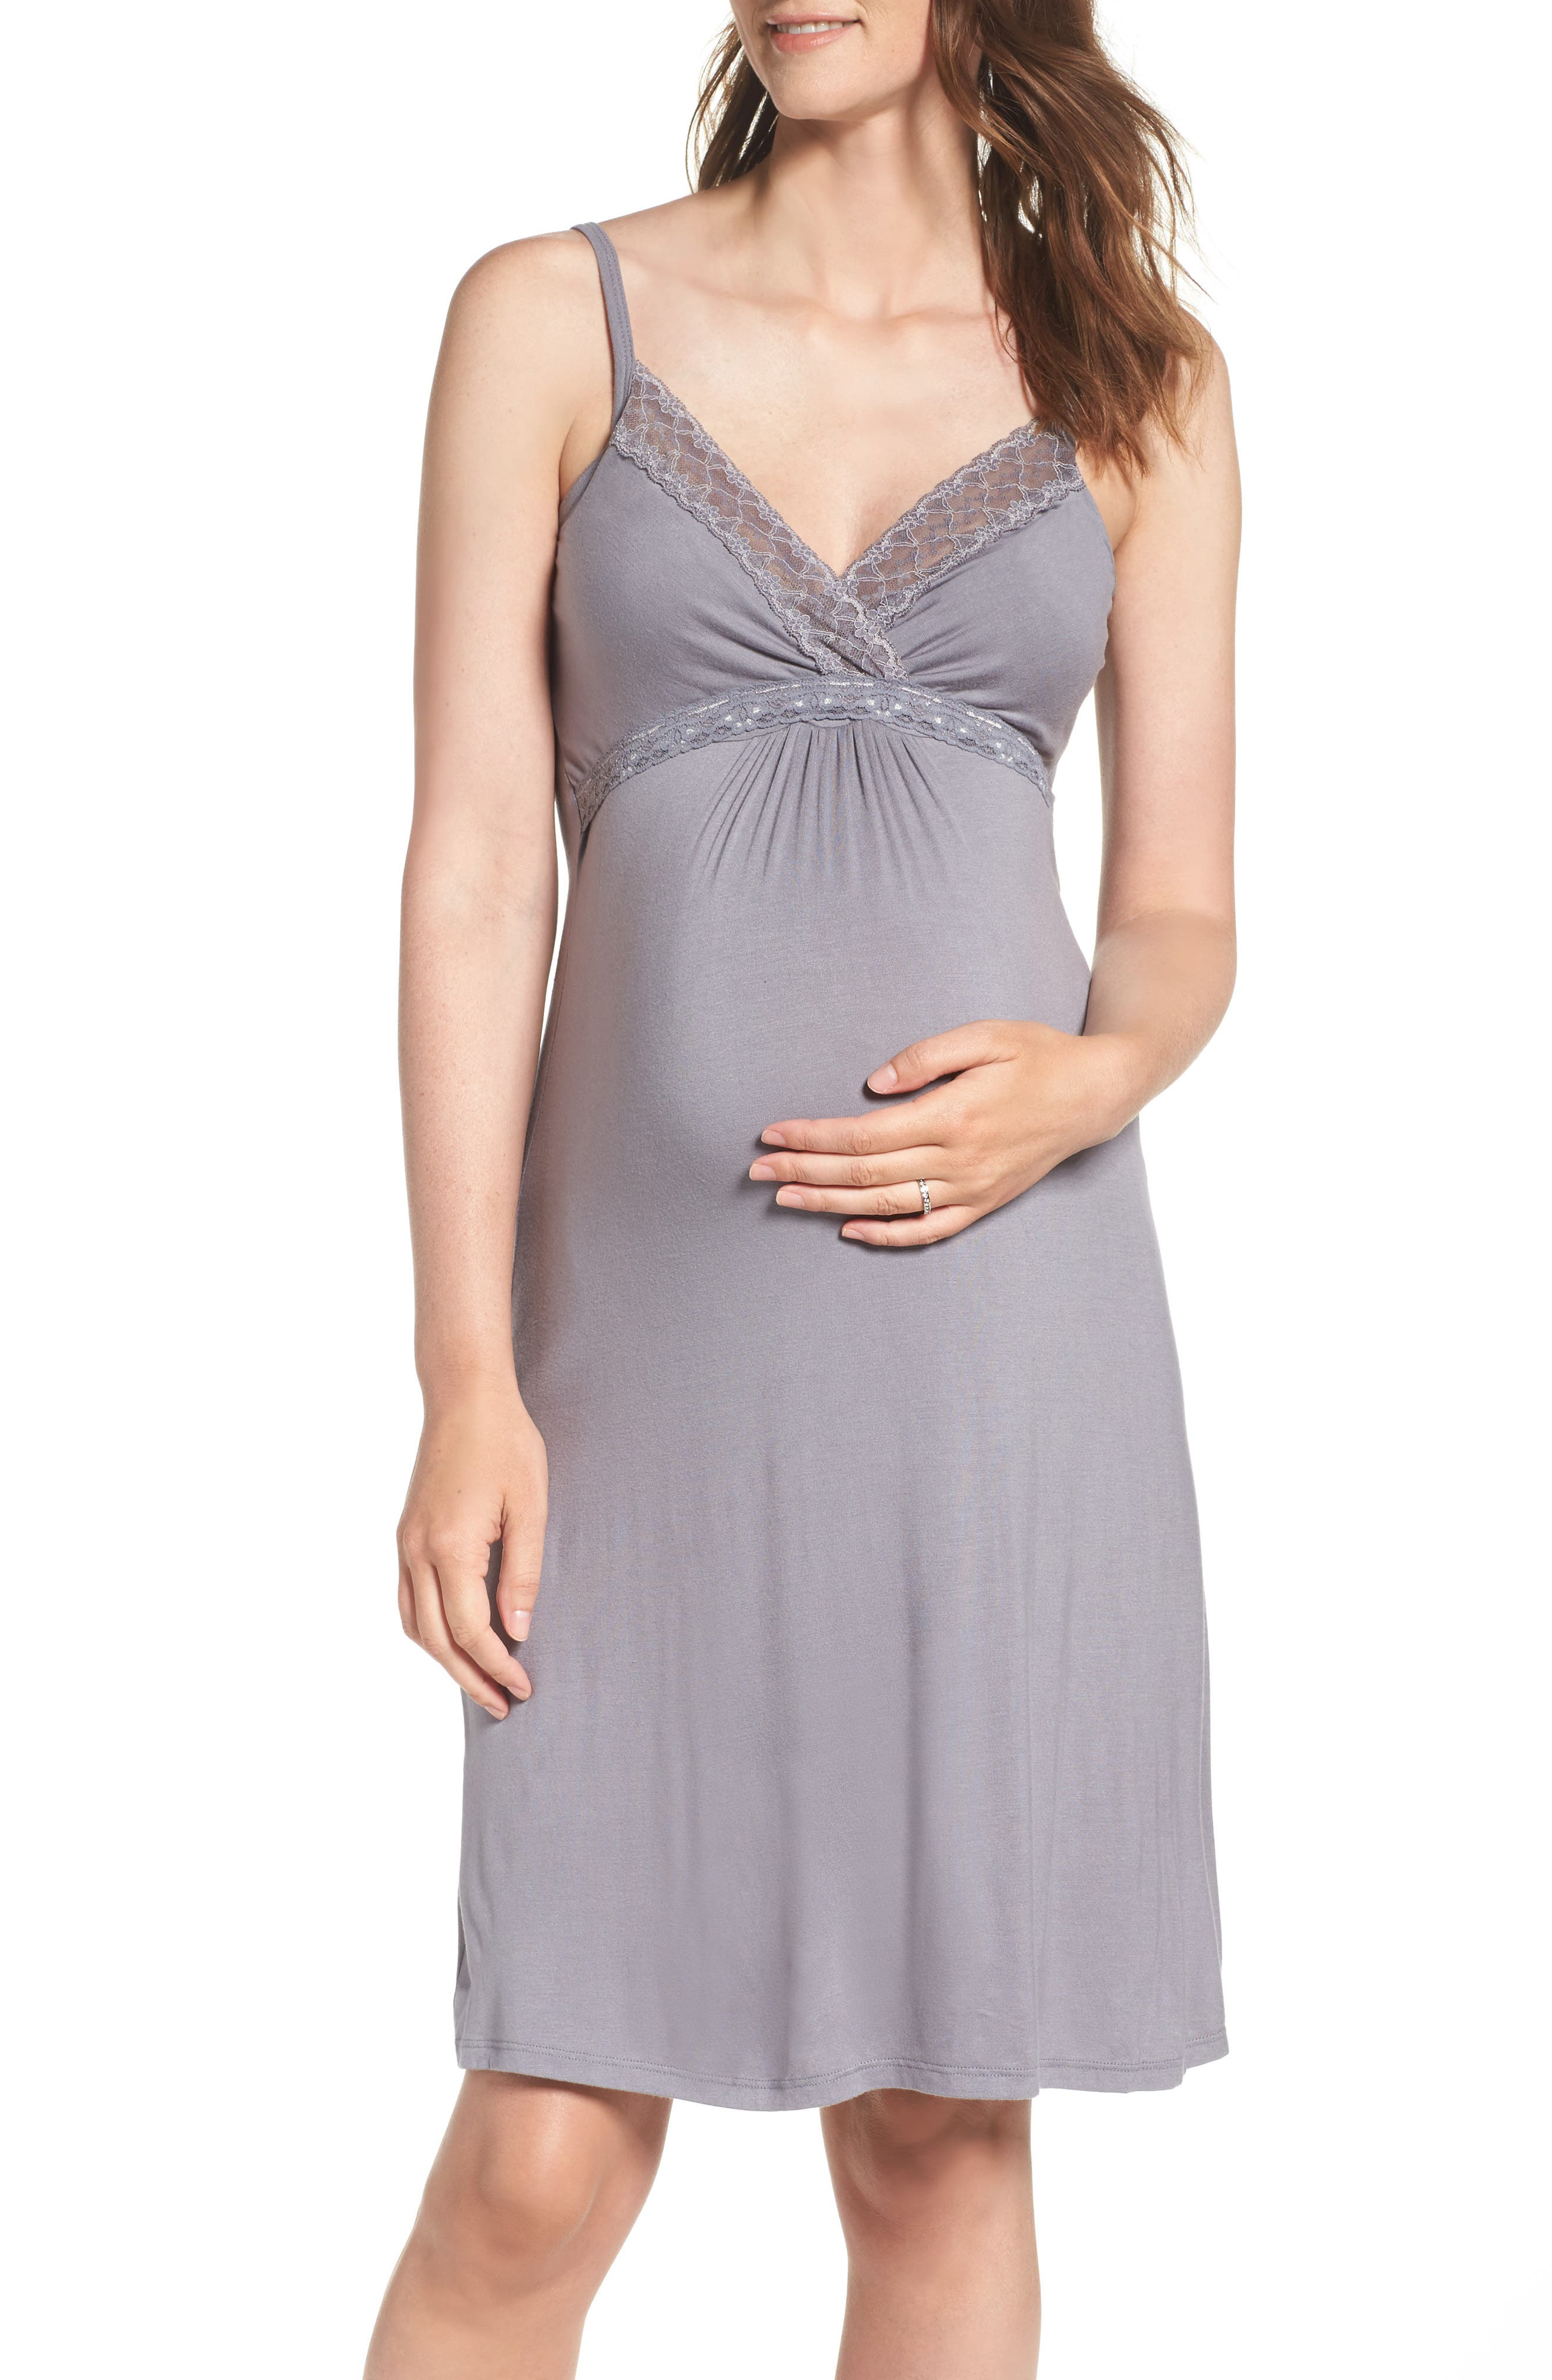 Belabumbum Maternity/Nursing Jersey Chemise